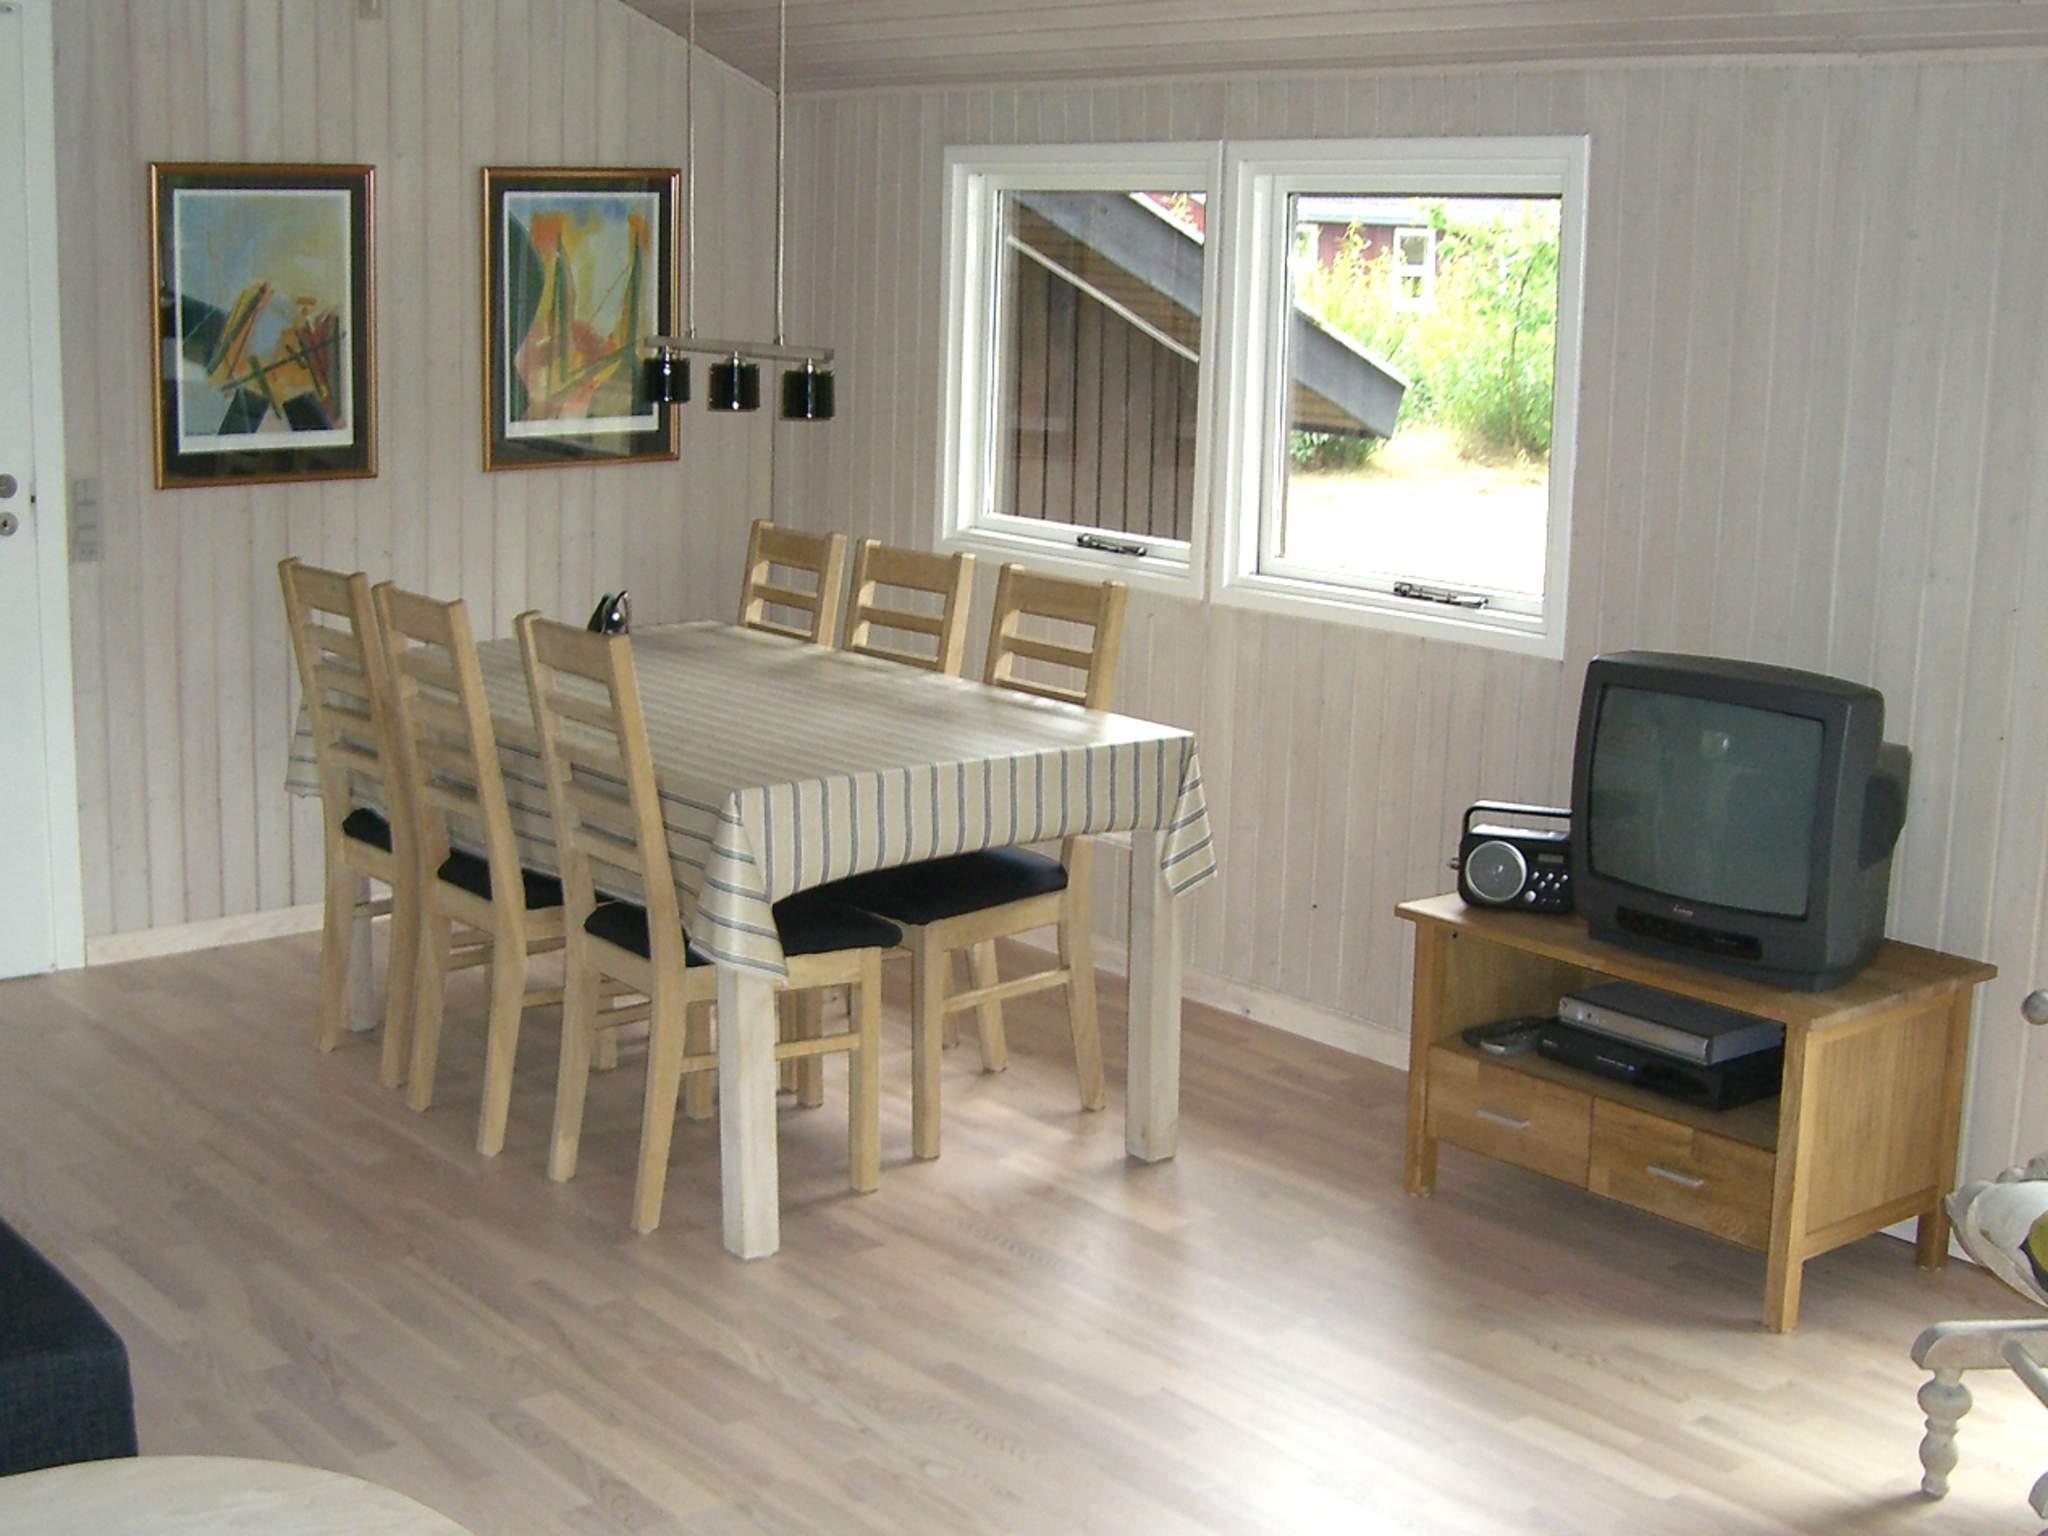 Maison de vacances Kramnitze (87258), Kramnitse, , Lolland, Danemark, image 5